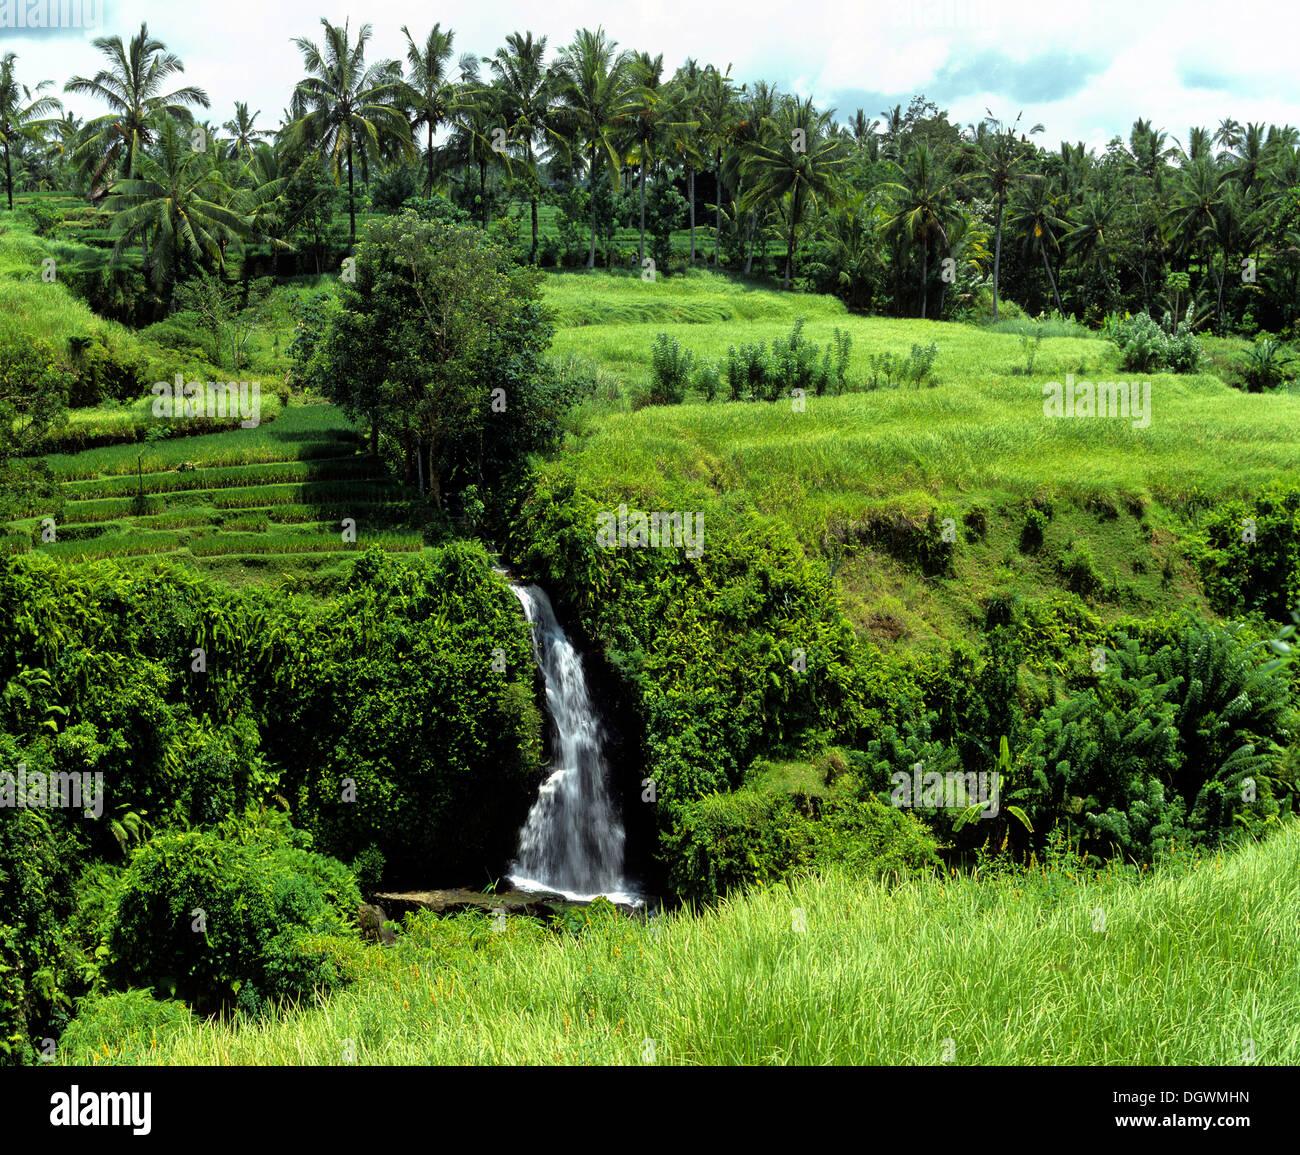 Waterfall, rice paddies, terraced fields and coconut trees, Ubud, Bali, Südostasien, Indonesia - Stock Image